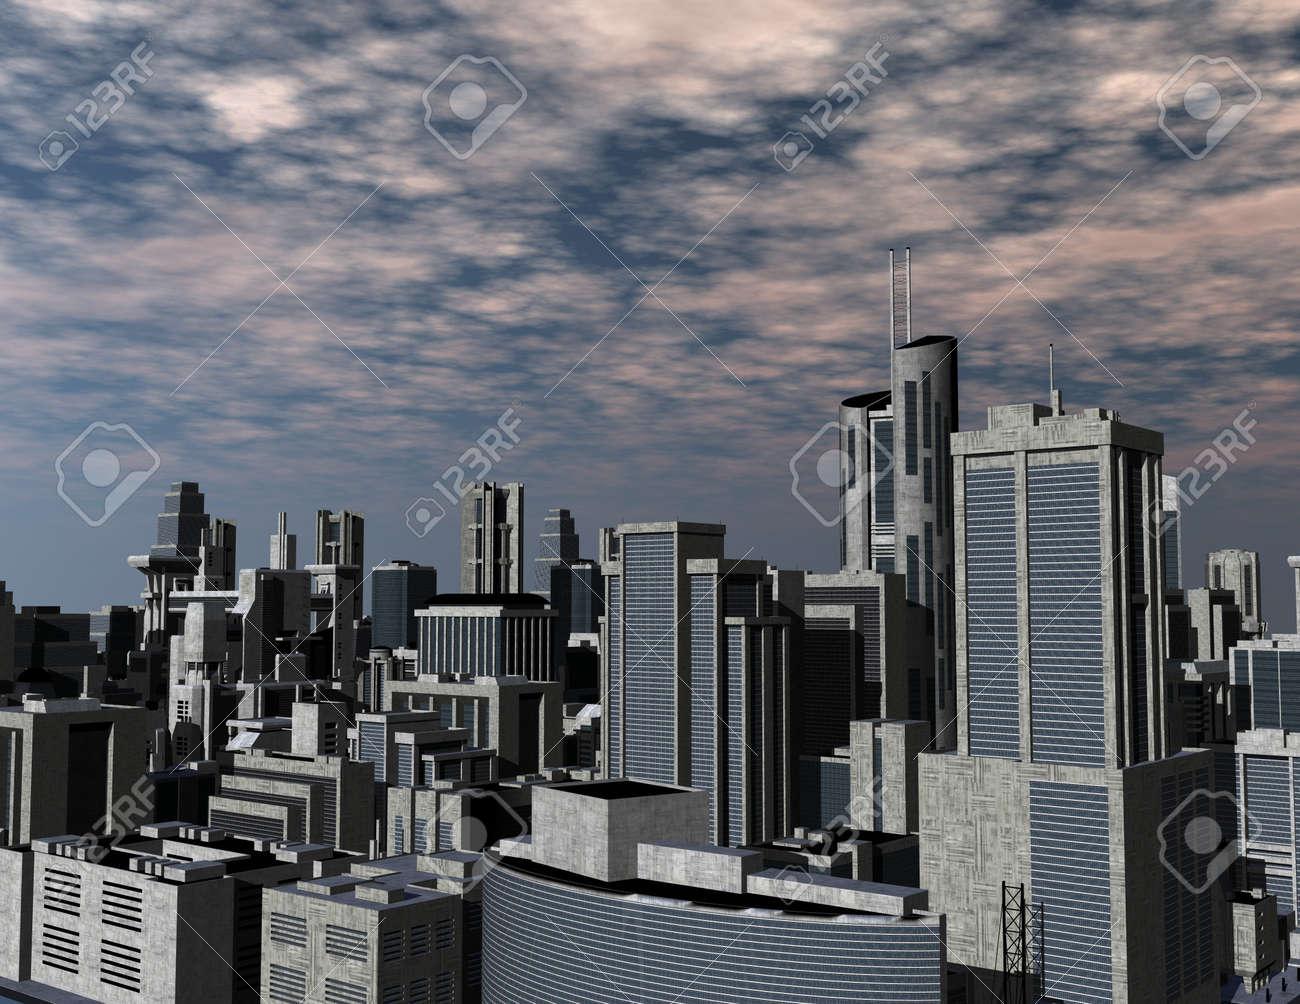 digital rendering of a futuristic city Stock Photo - 8076849